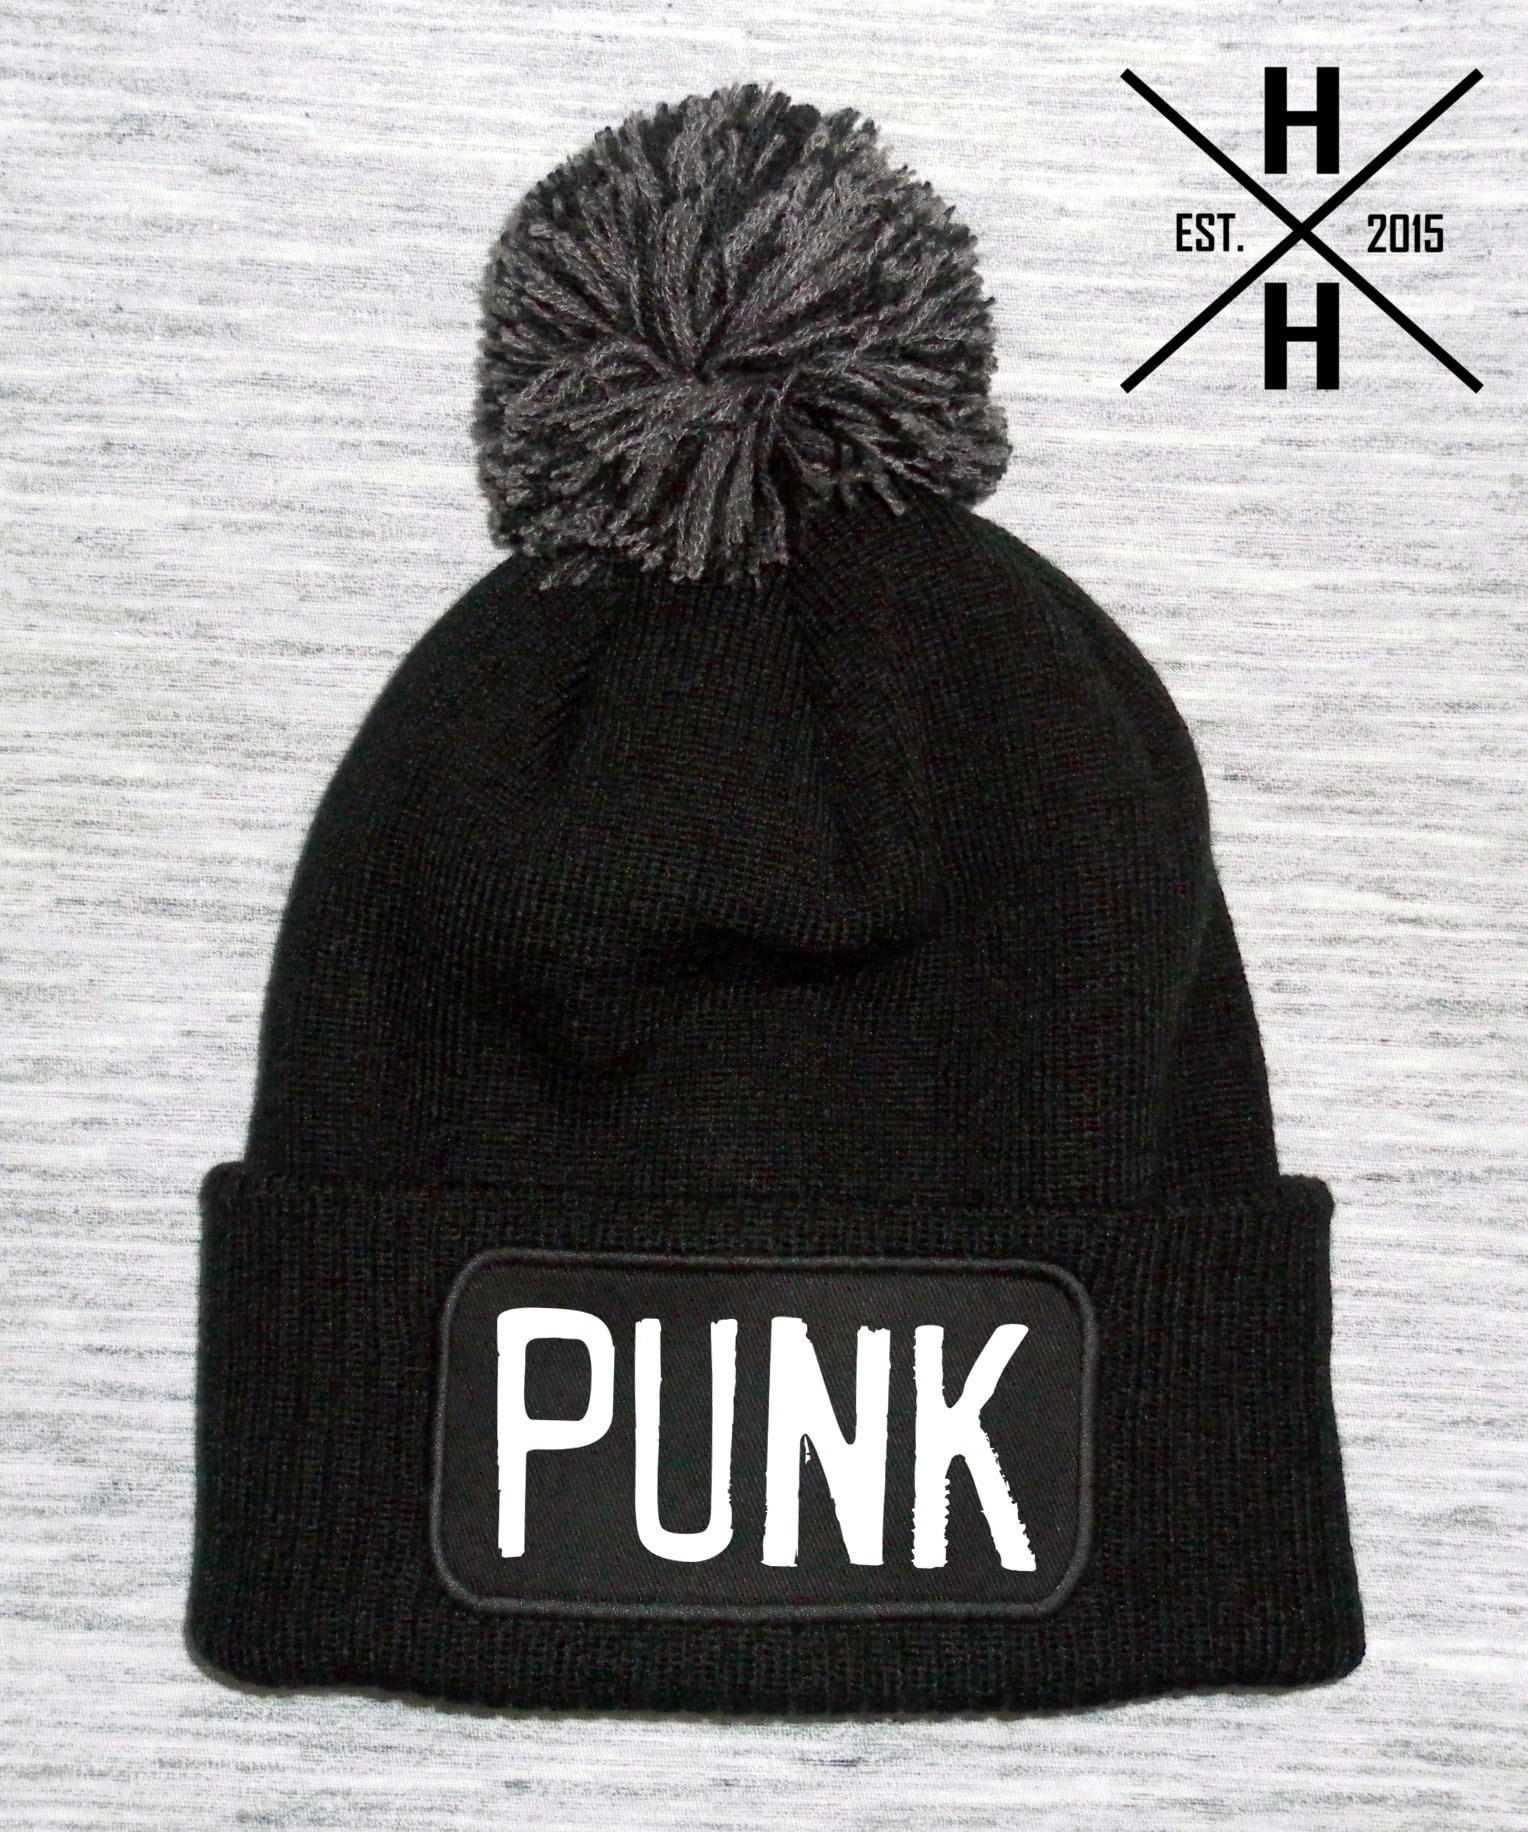 Punk bobble hat punk bobble hats punk beanie hats black etsy jpg 1528x1832 Punk  beanie 4eb57bb69226